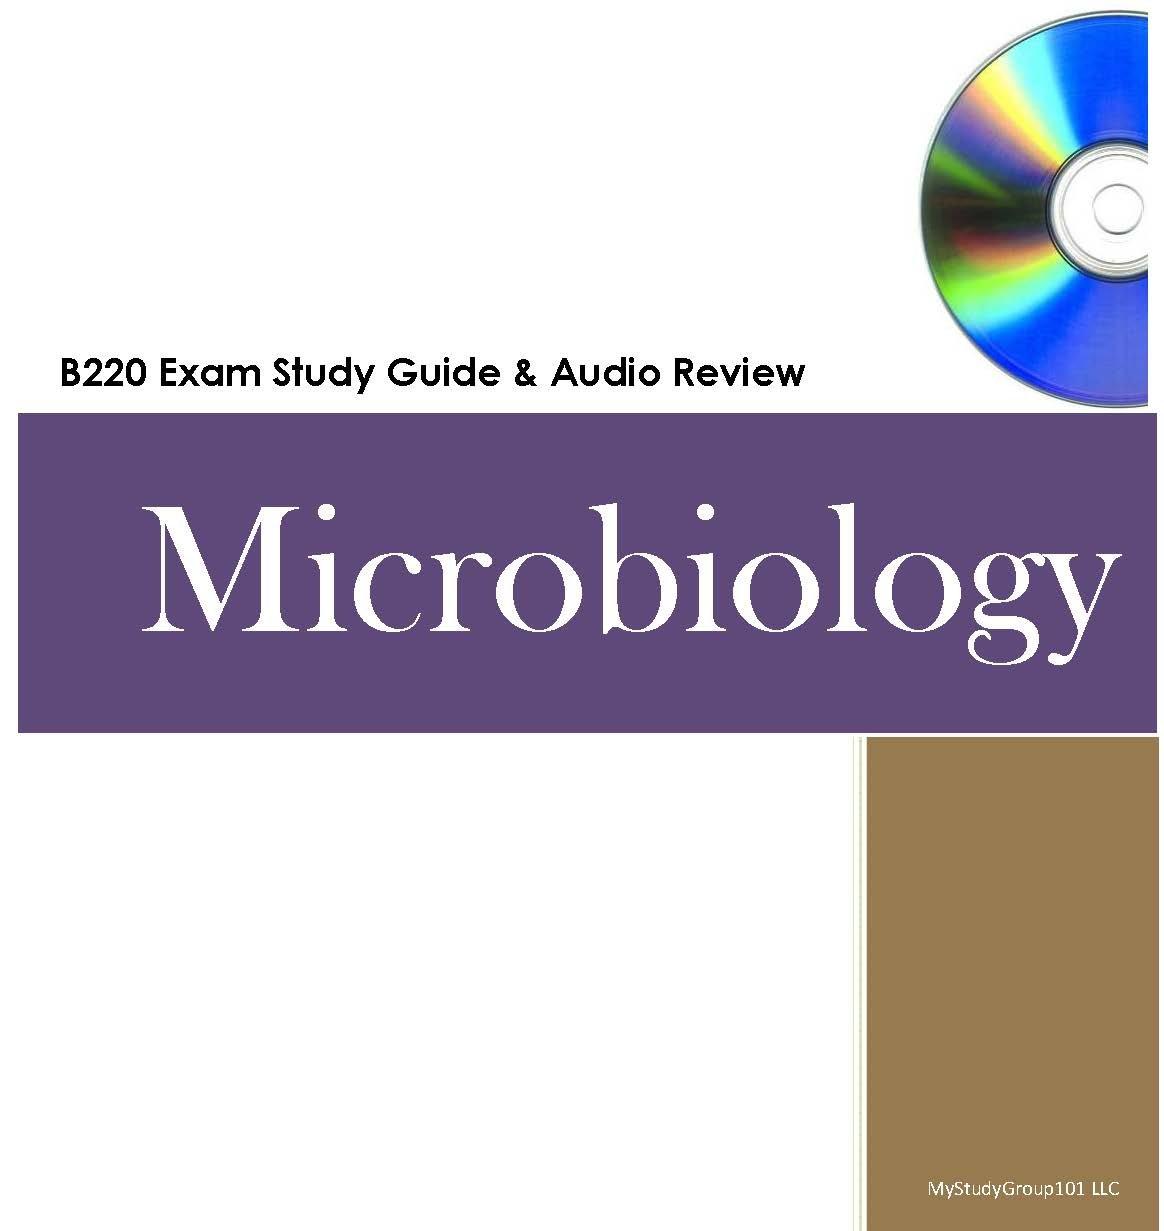 Amazon.com: MyStudyGroup101 Microbiology Exam PDF Study Guide ...